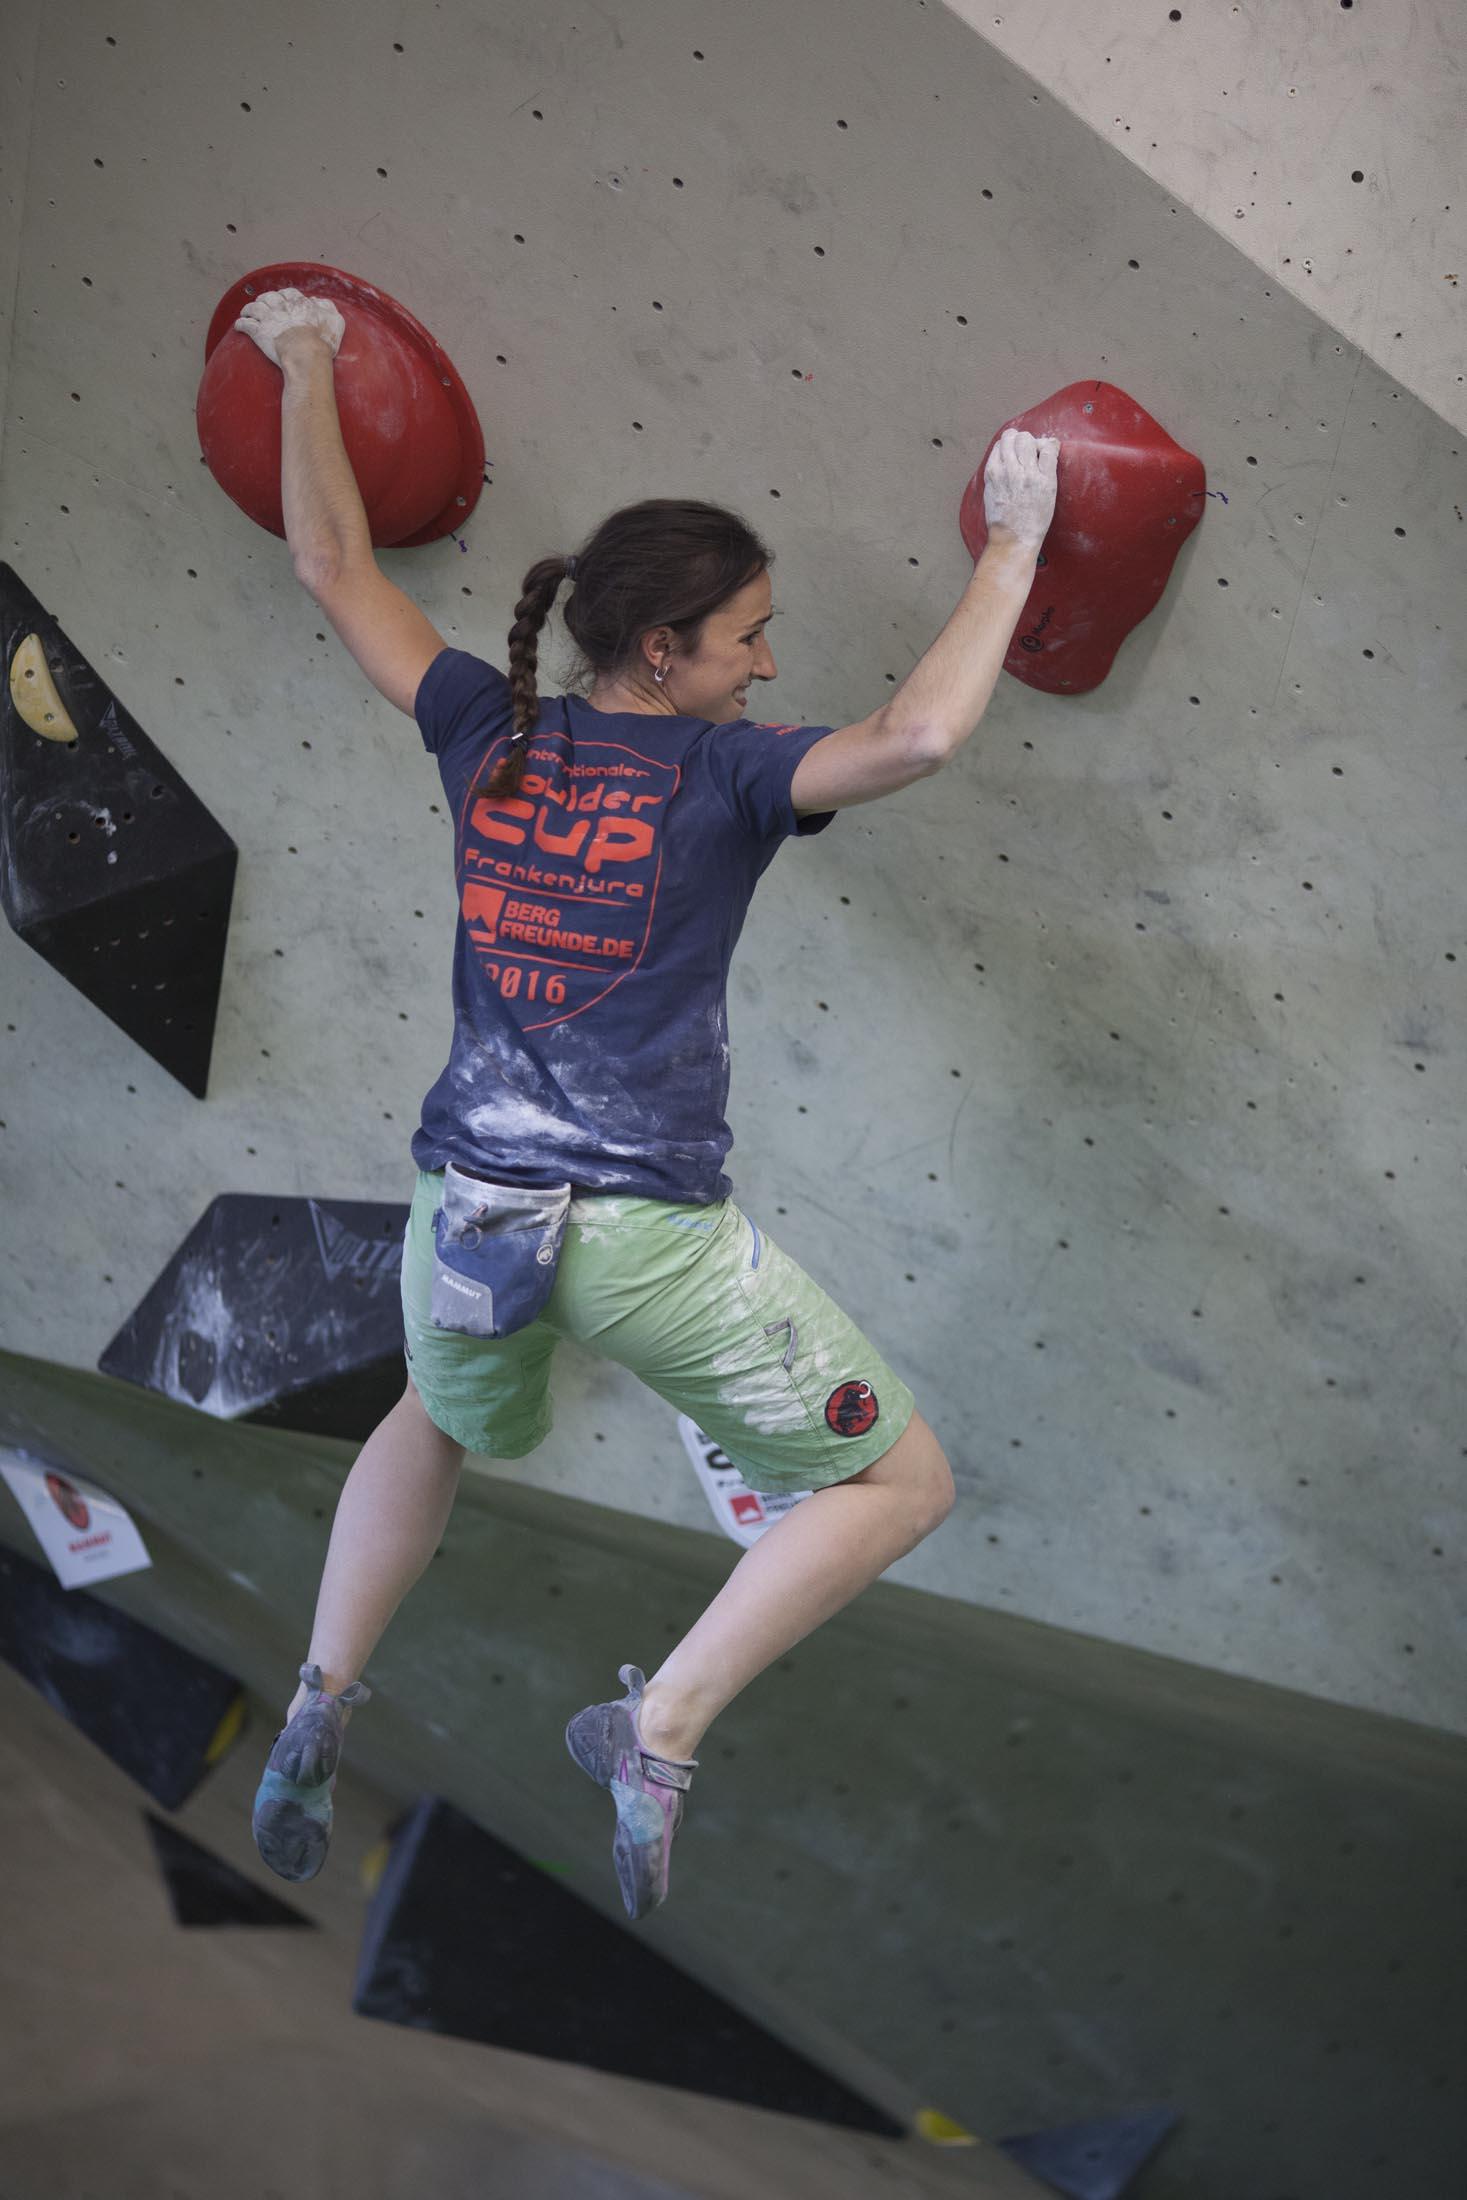 Juliane Wurm, internationaler bouldercup Frankenjura, BLOCKHELDEN Erlangen, Bergfreunde.de, Mammut07092016042